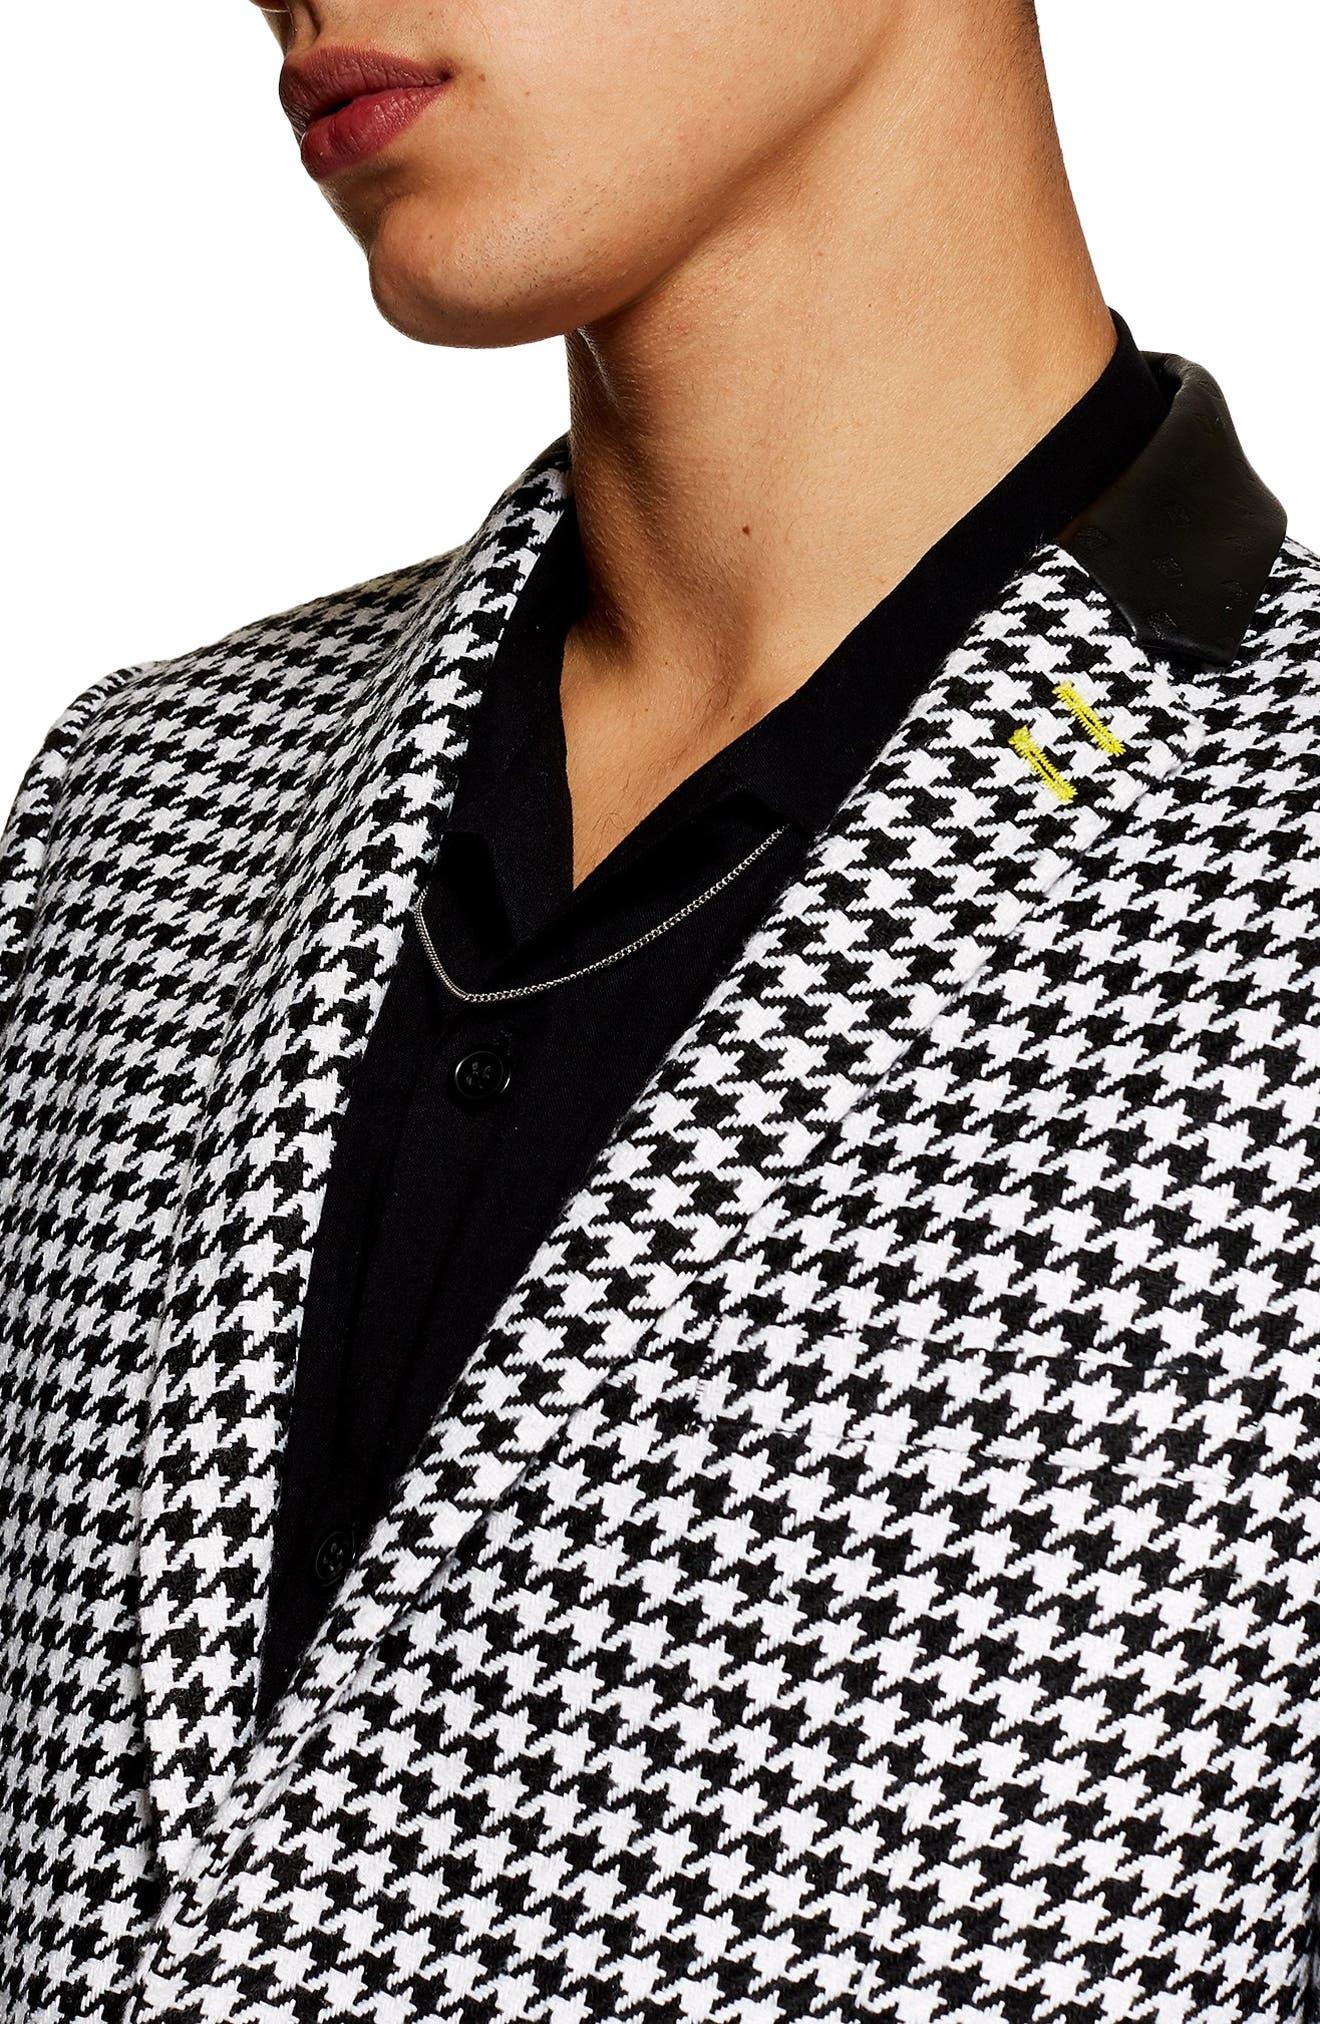 TOPMAN, Roe Skinny Fit Suit Jacket, Alternate thumbnail 5, color, 001